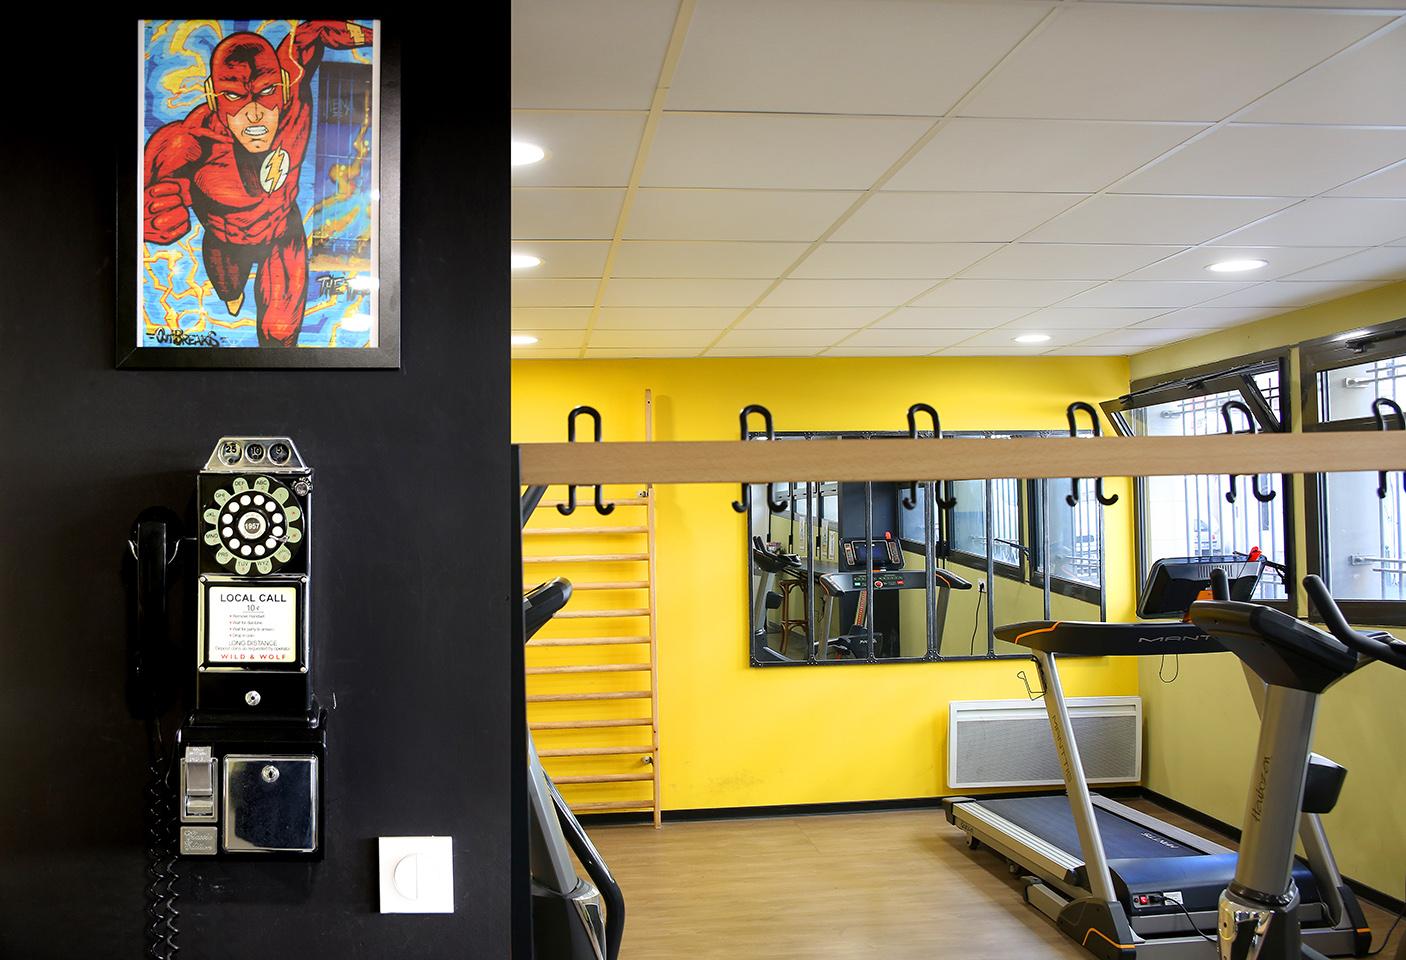 image  2019 06 21 residence etudiante suitetudes le 124 marseille salle de fitness.JPG